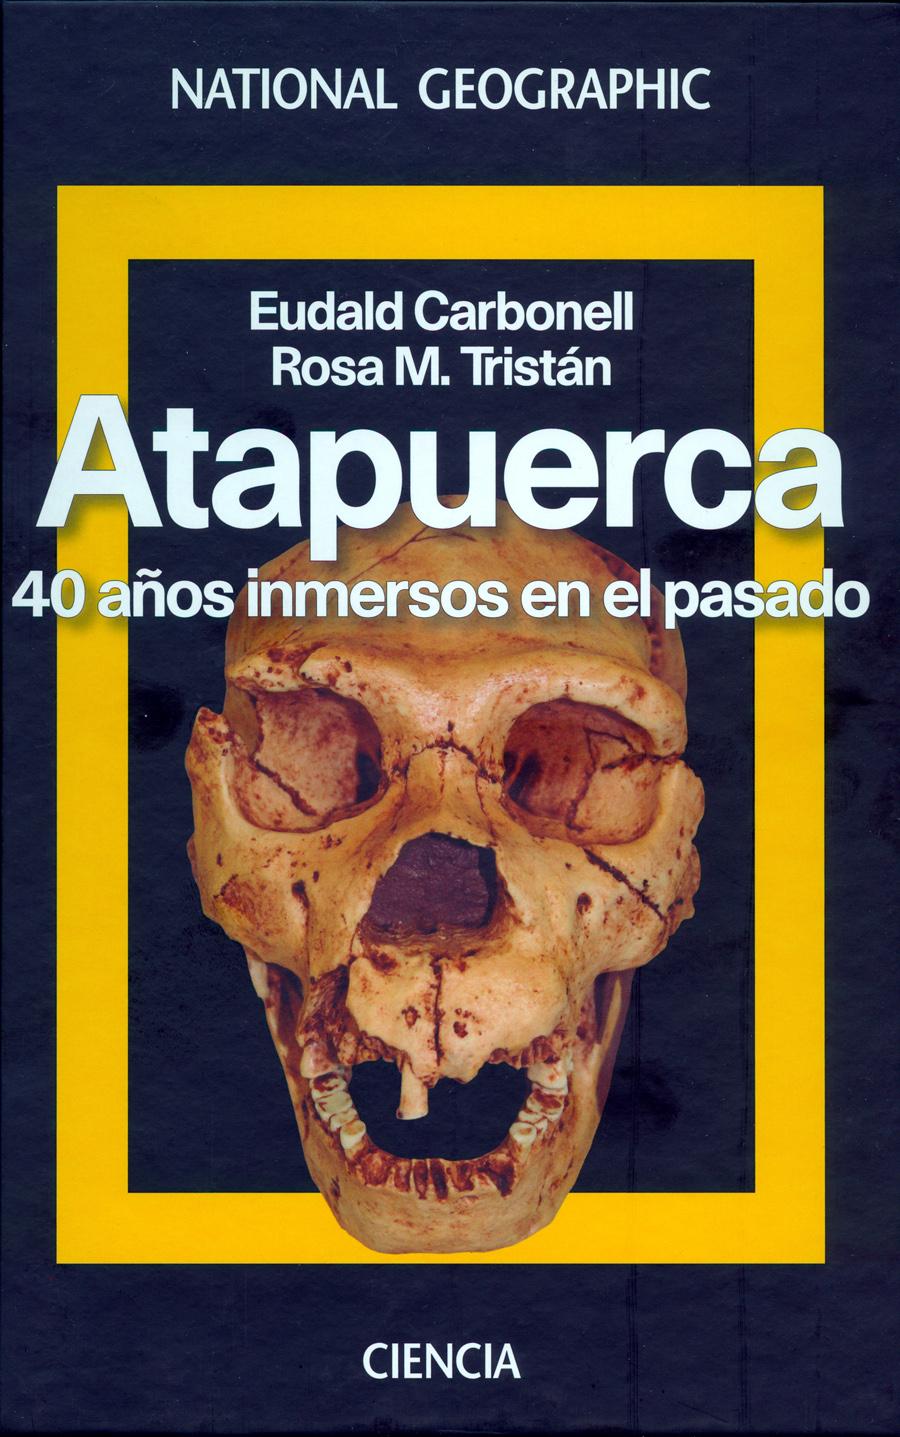 https://grupoedelweiss.com/web/images/stories/articulos/gee/noticiasexternas/Portada_Atapuerca_40_a%C3%B1os_inmersos_en_el_pasado.jpg